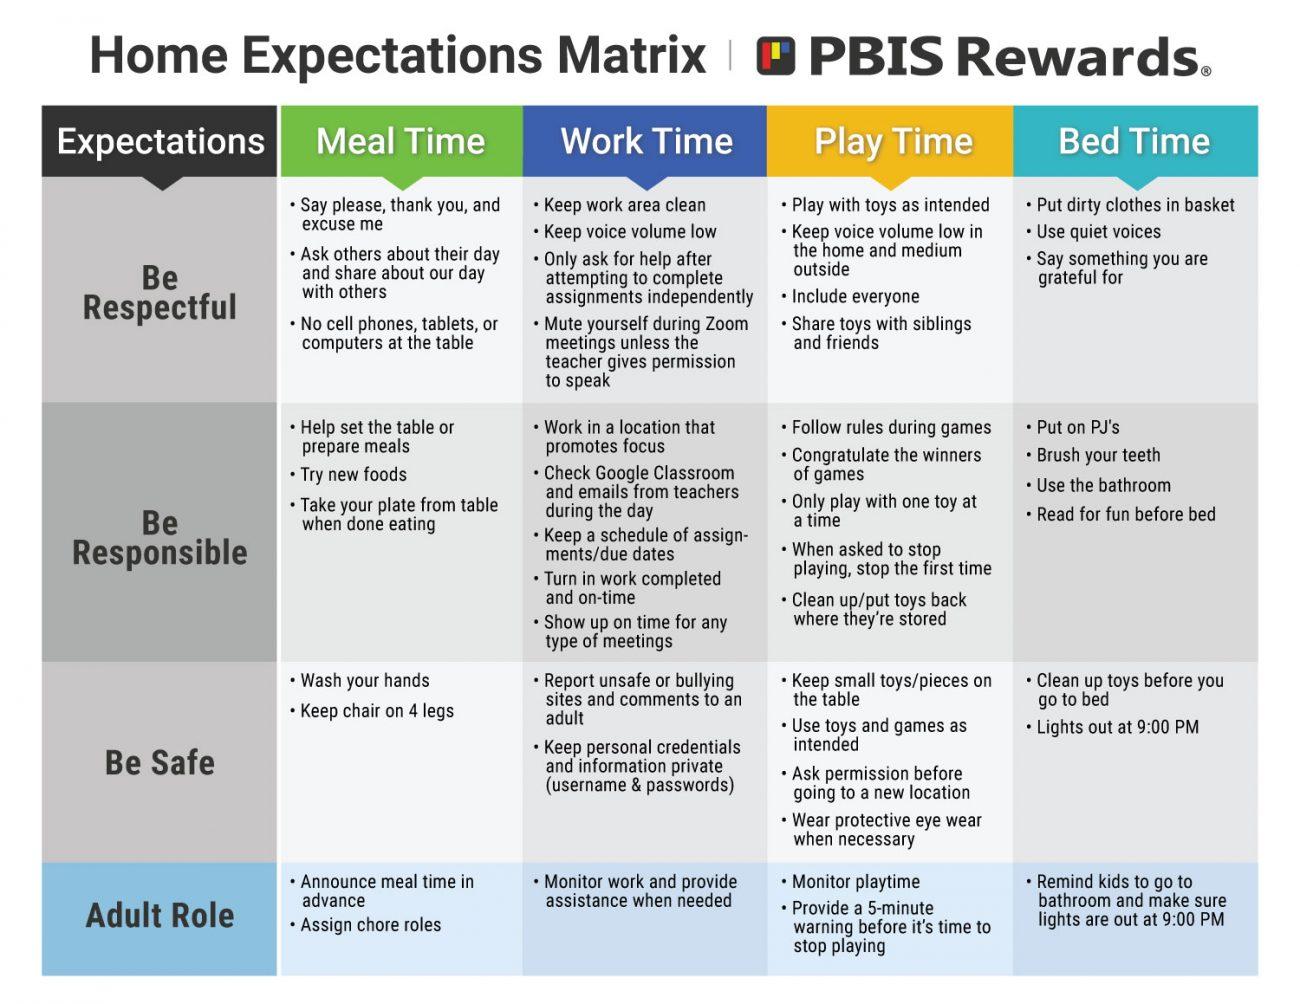 Home Expectations Behavior Matrix